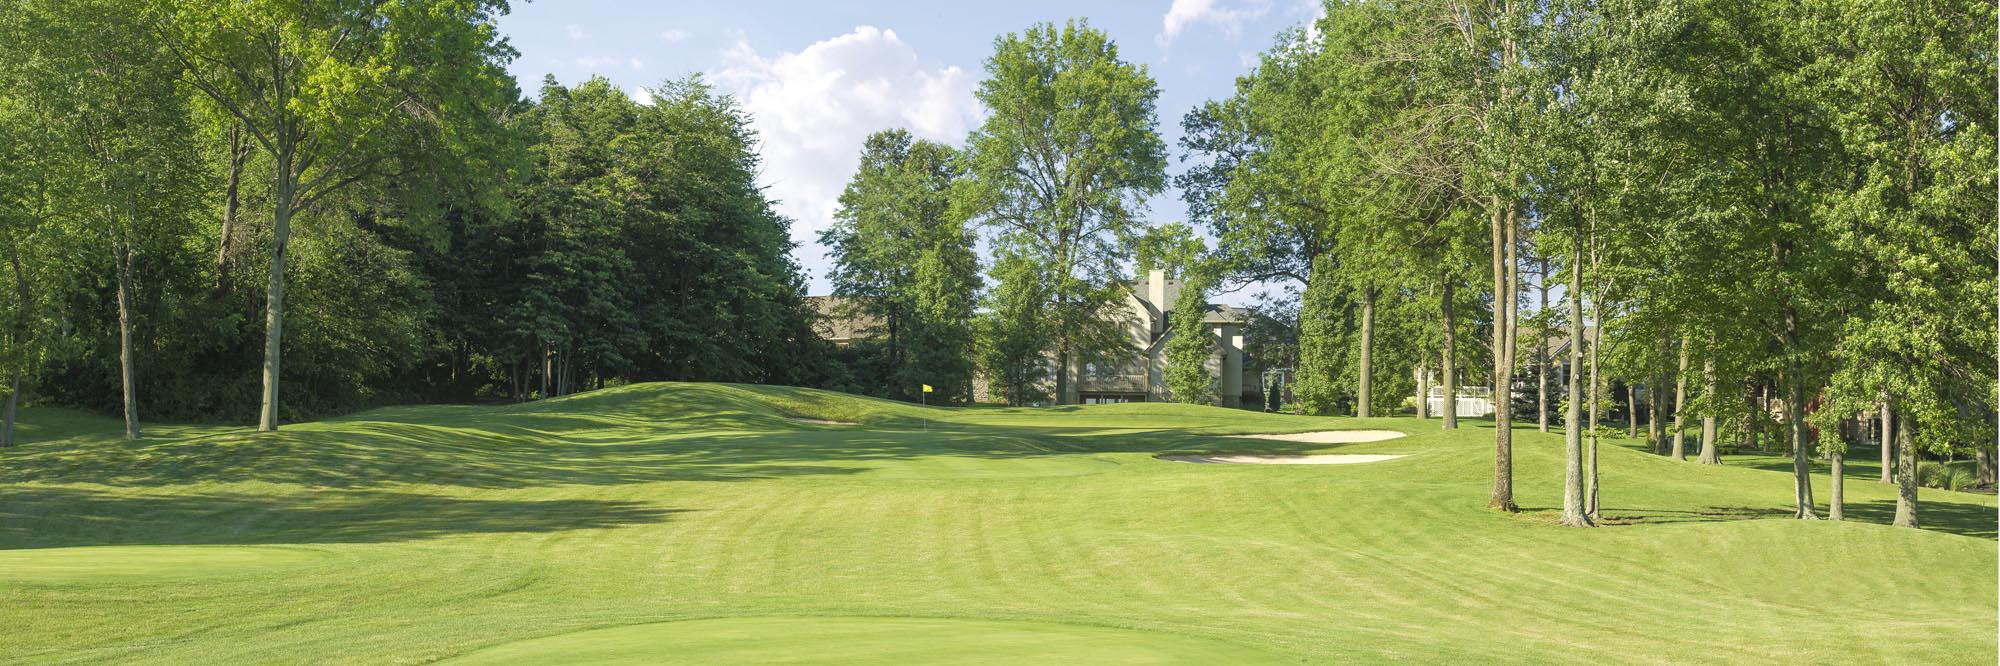 Golf Course Image - Jefferson Country Club No. 15